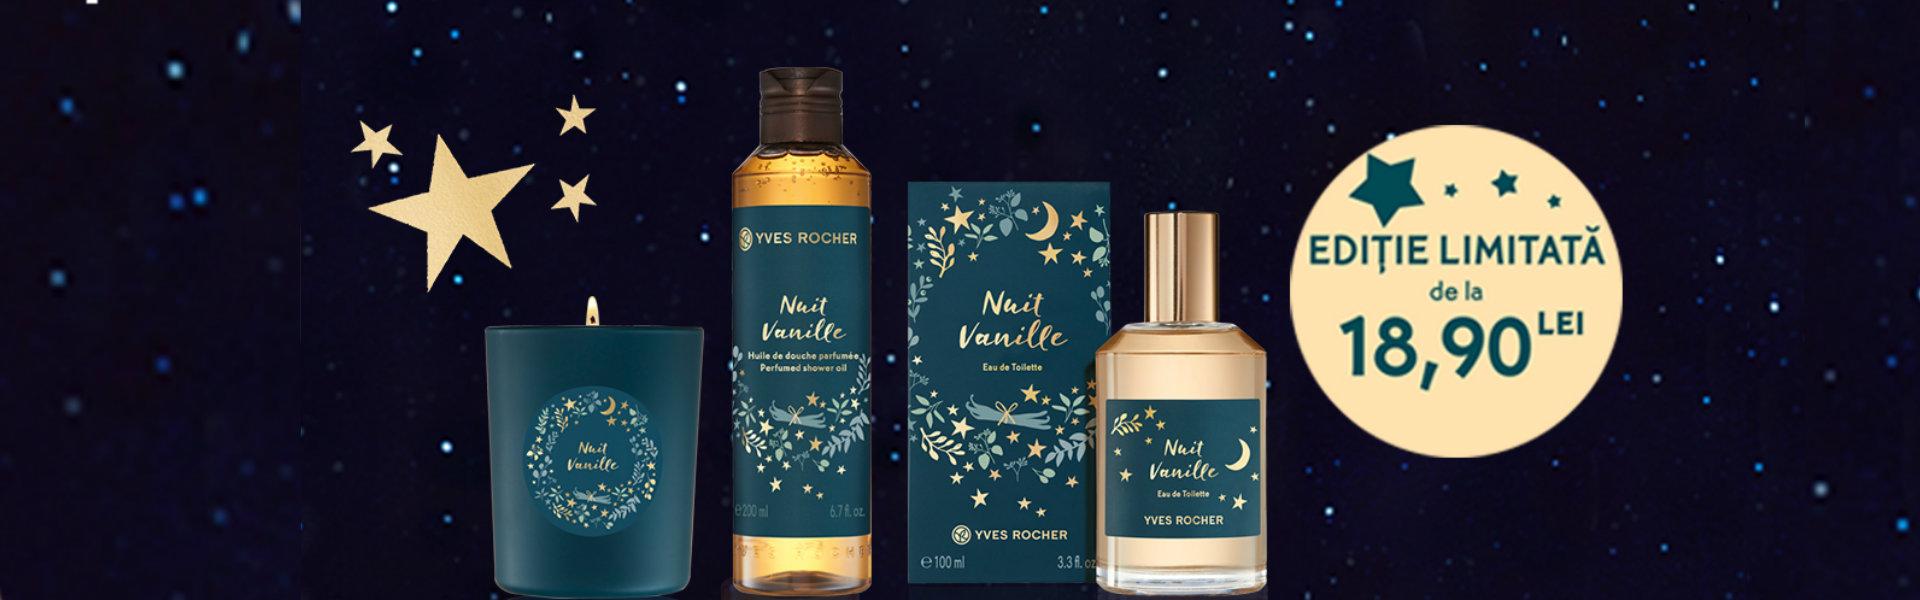 Imagini pentru yves rocher nuit vanille